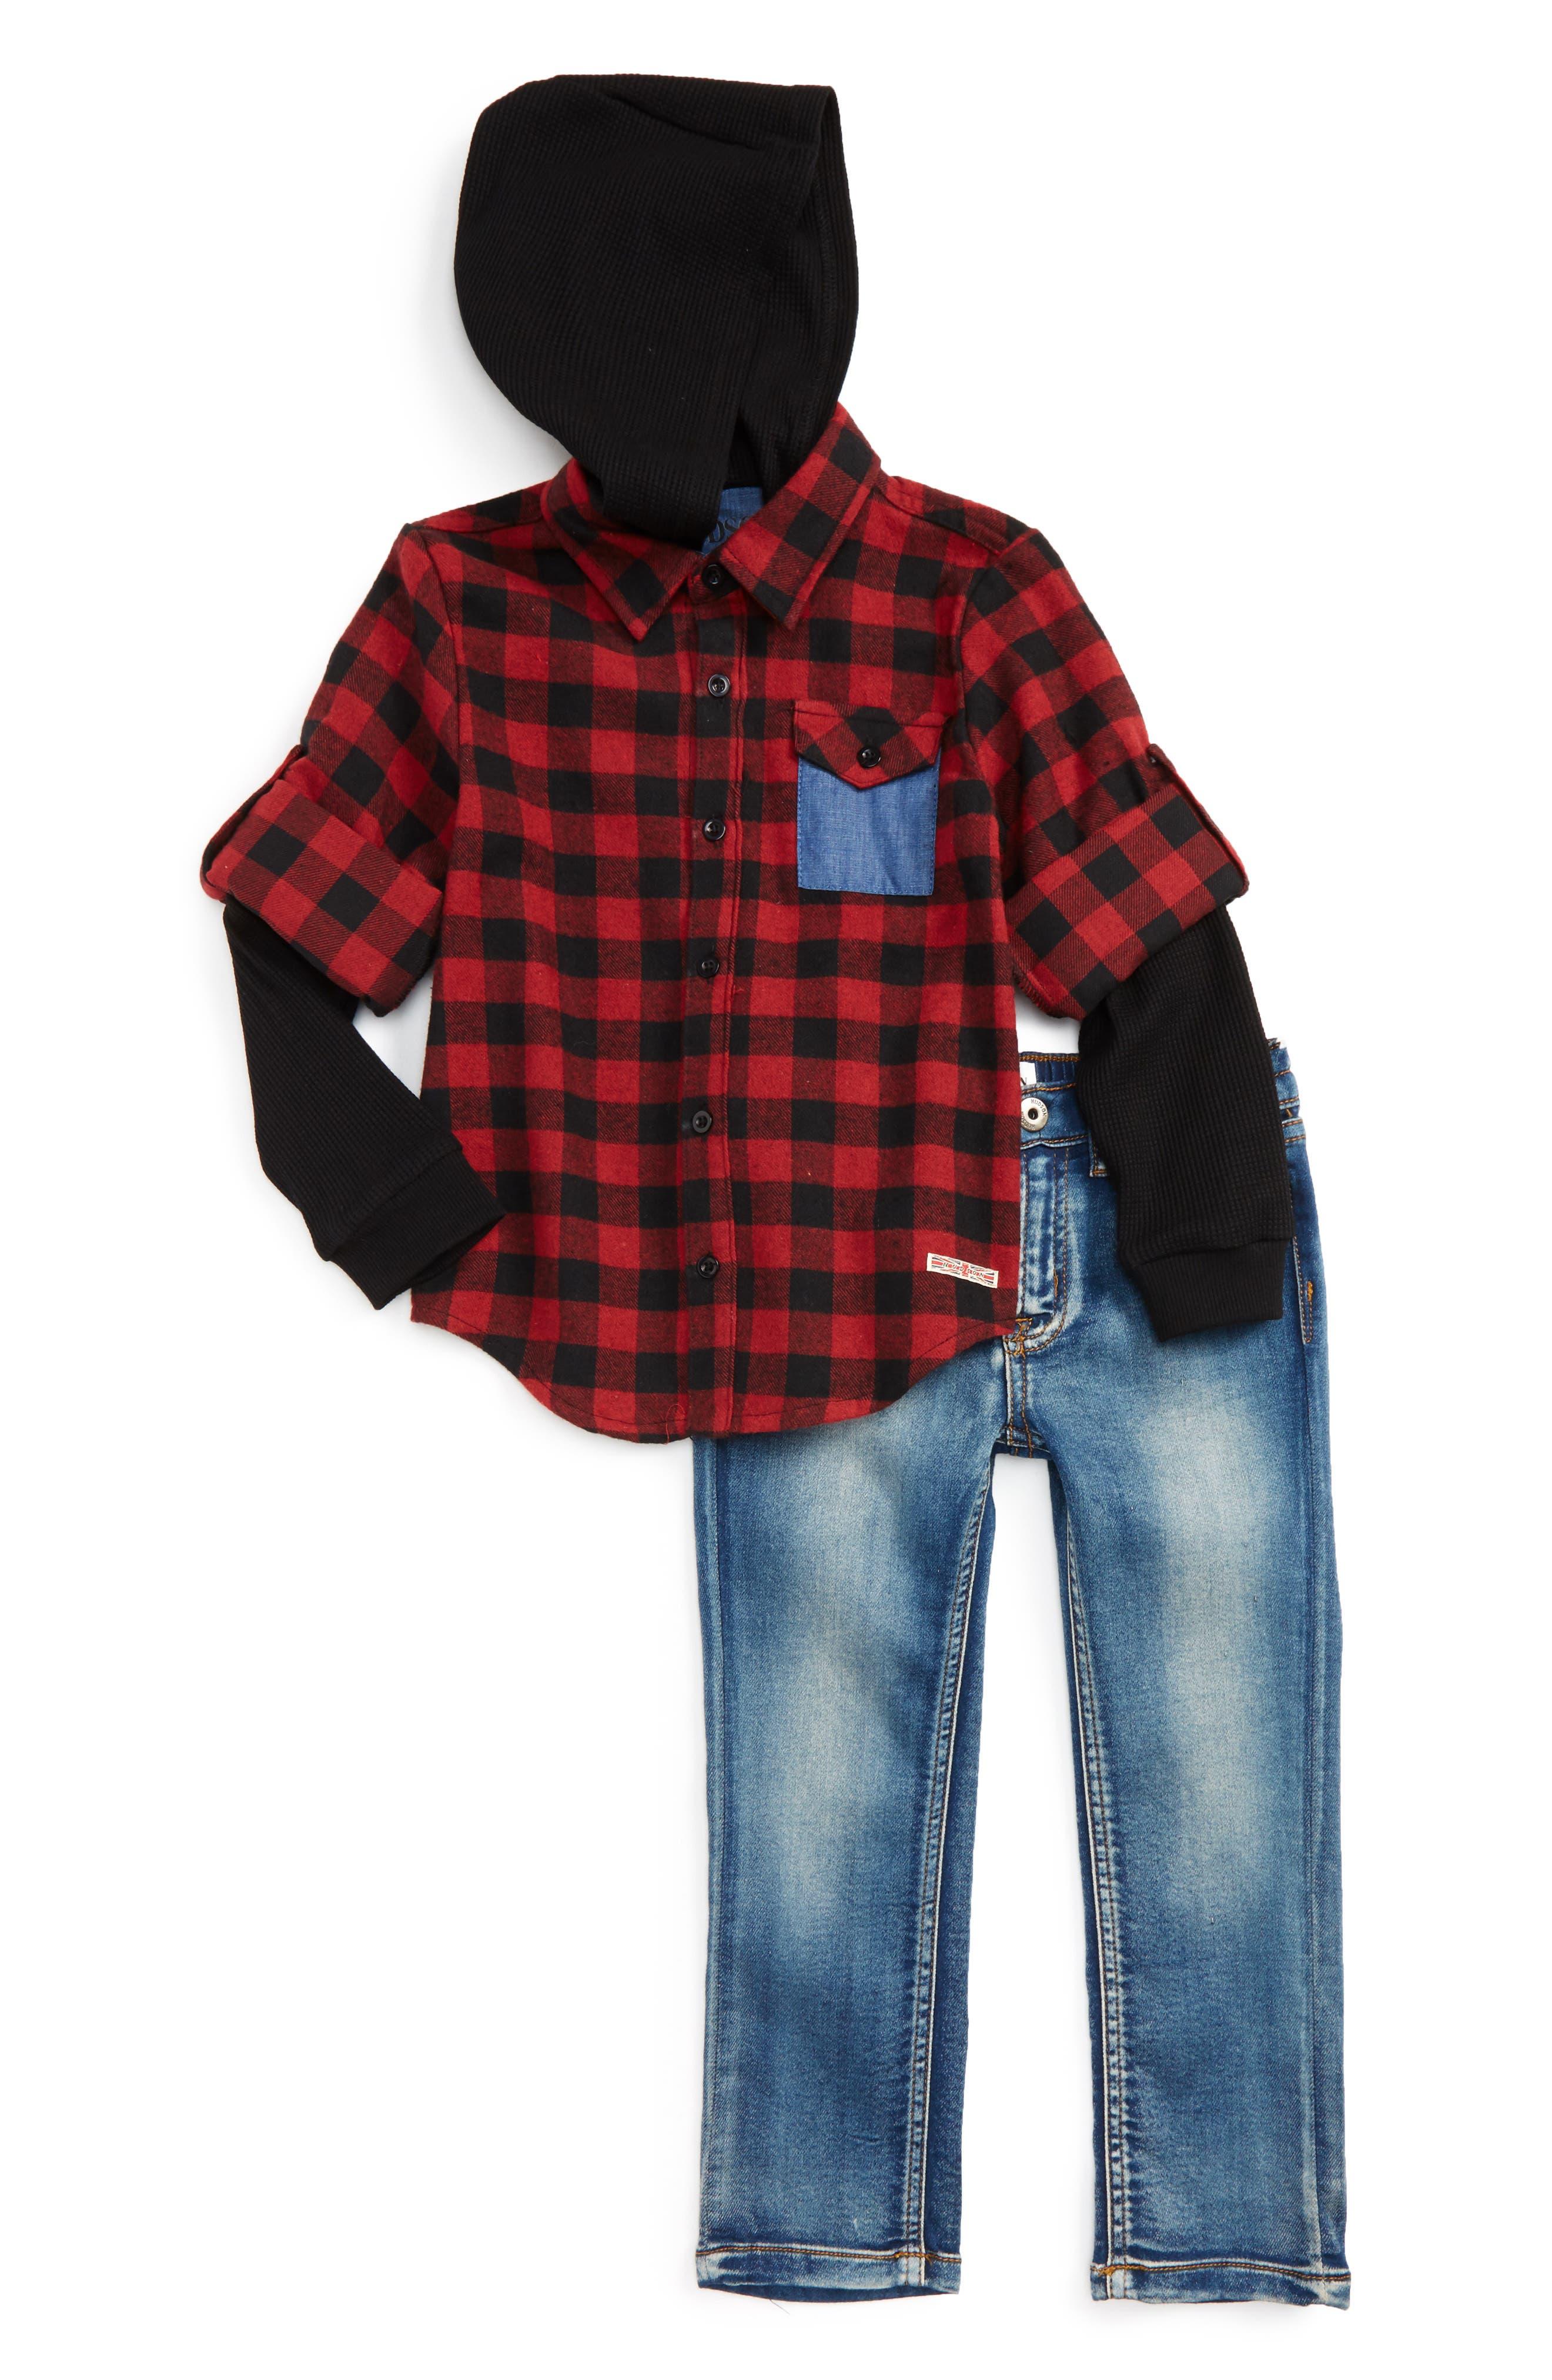 Main Image - Hudson Kids Hooded Flannel Shirt & Stretch Pants Set (Toddler Boys)